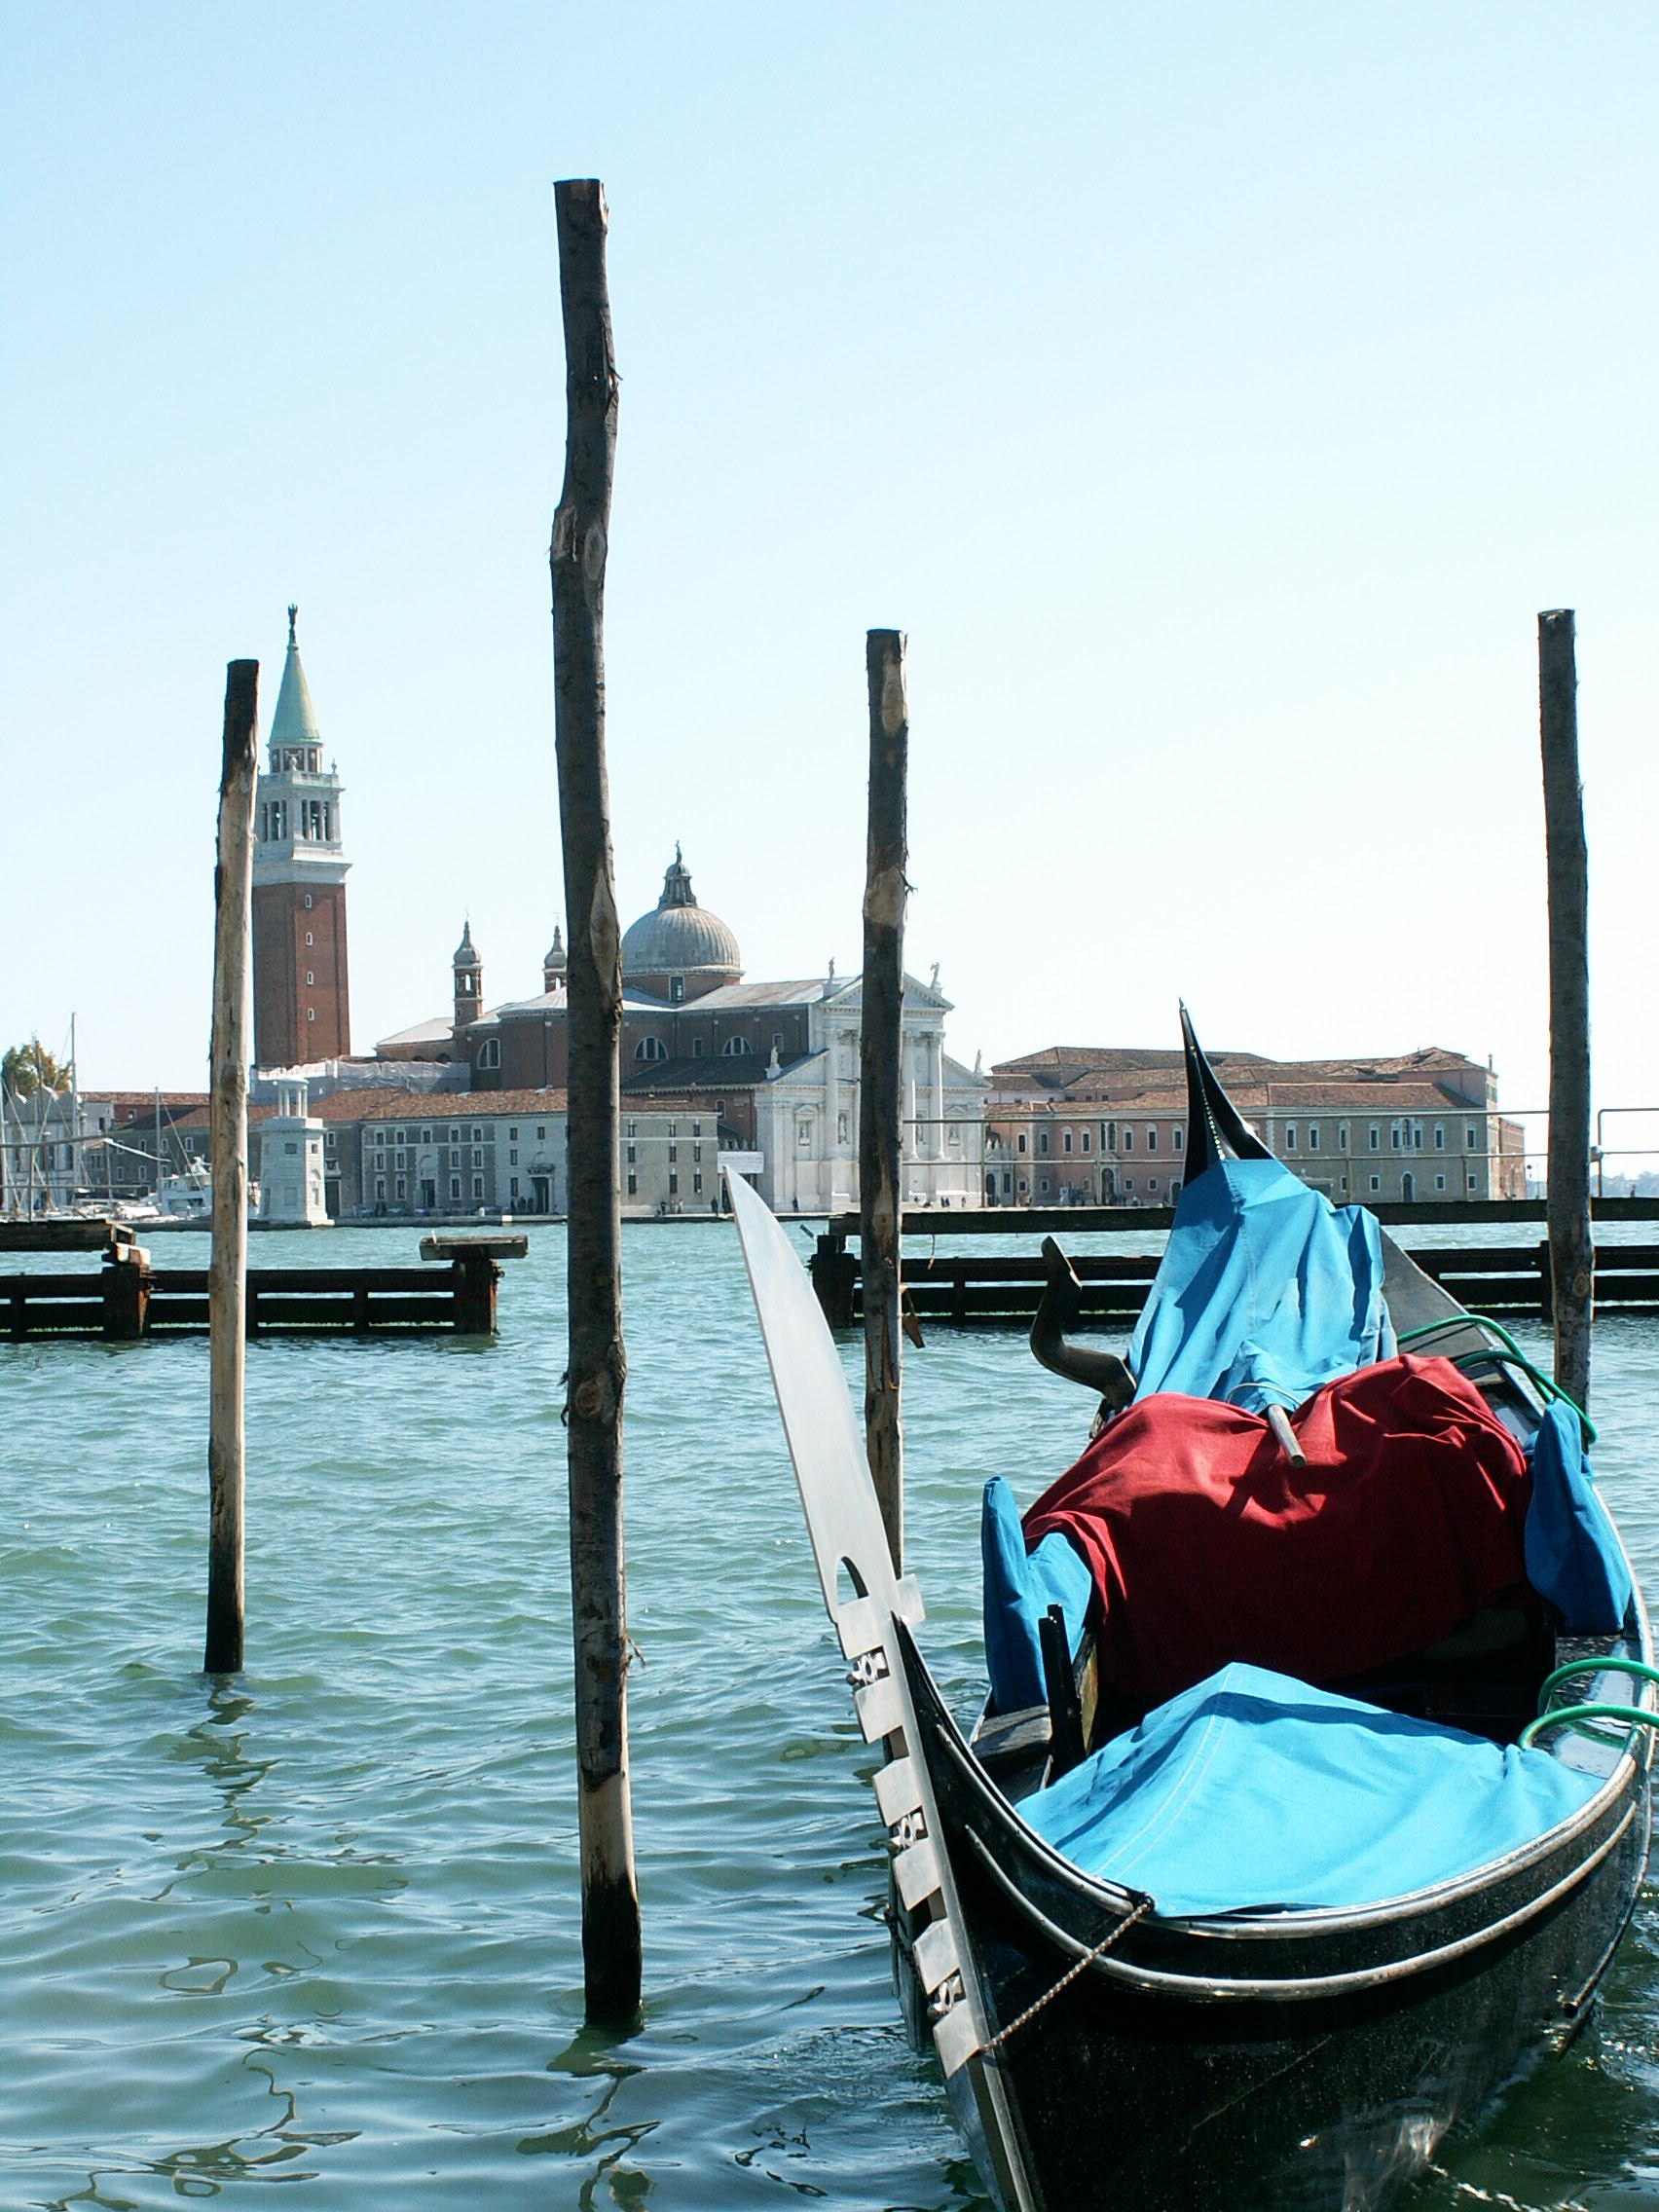 PartyGaming expand Italian operation